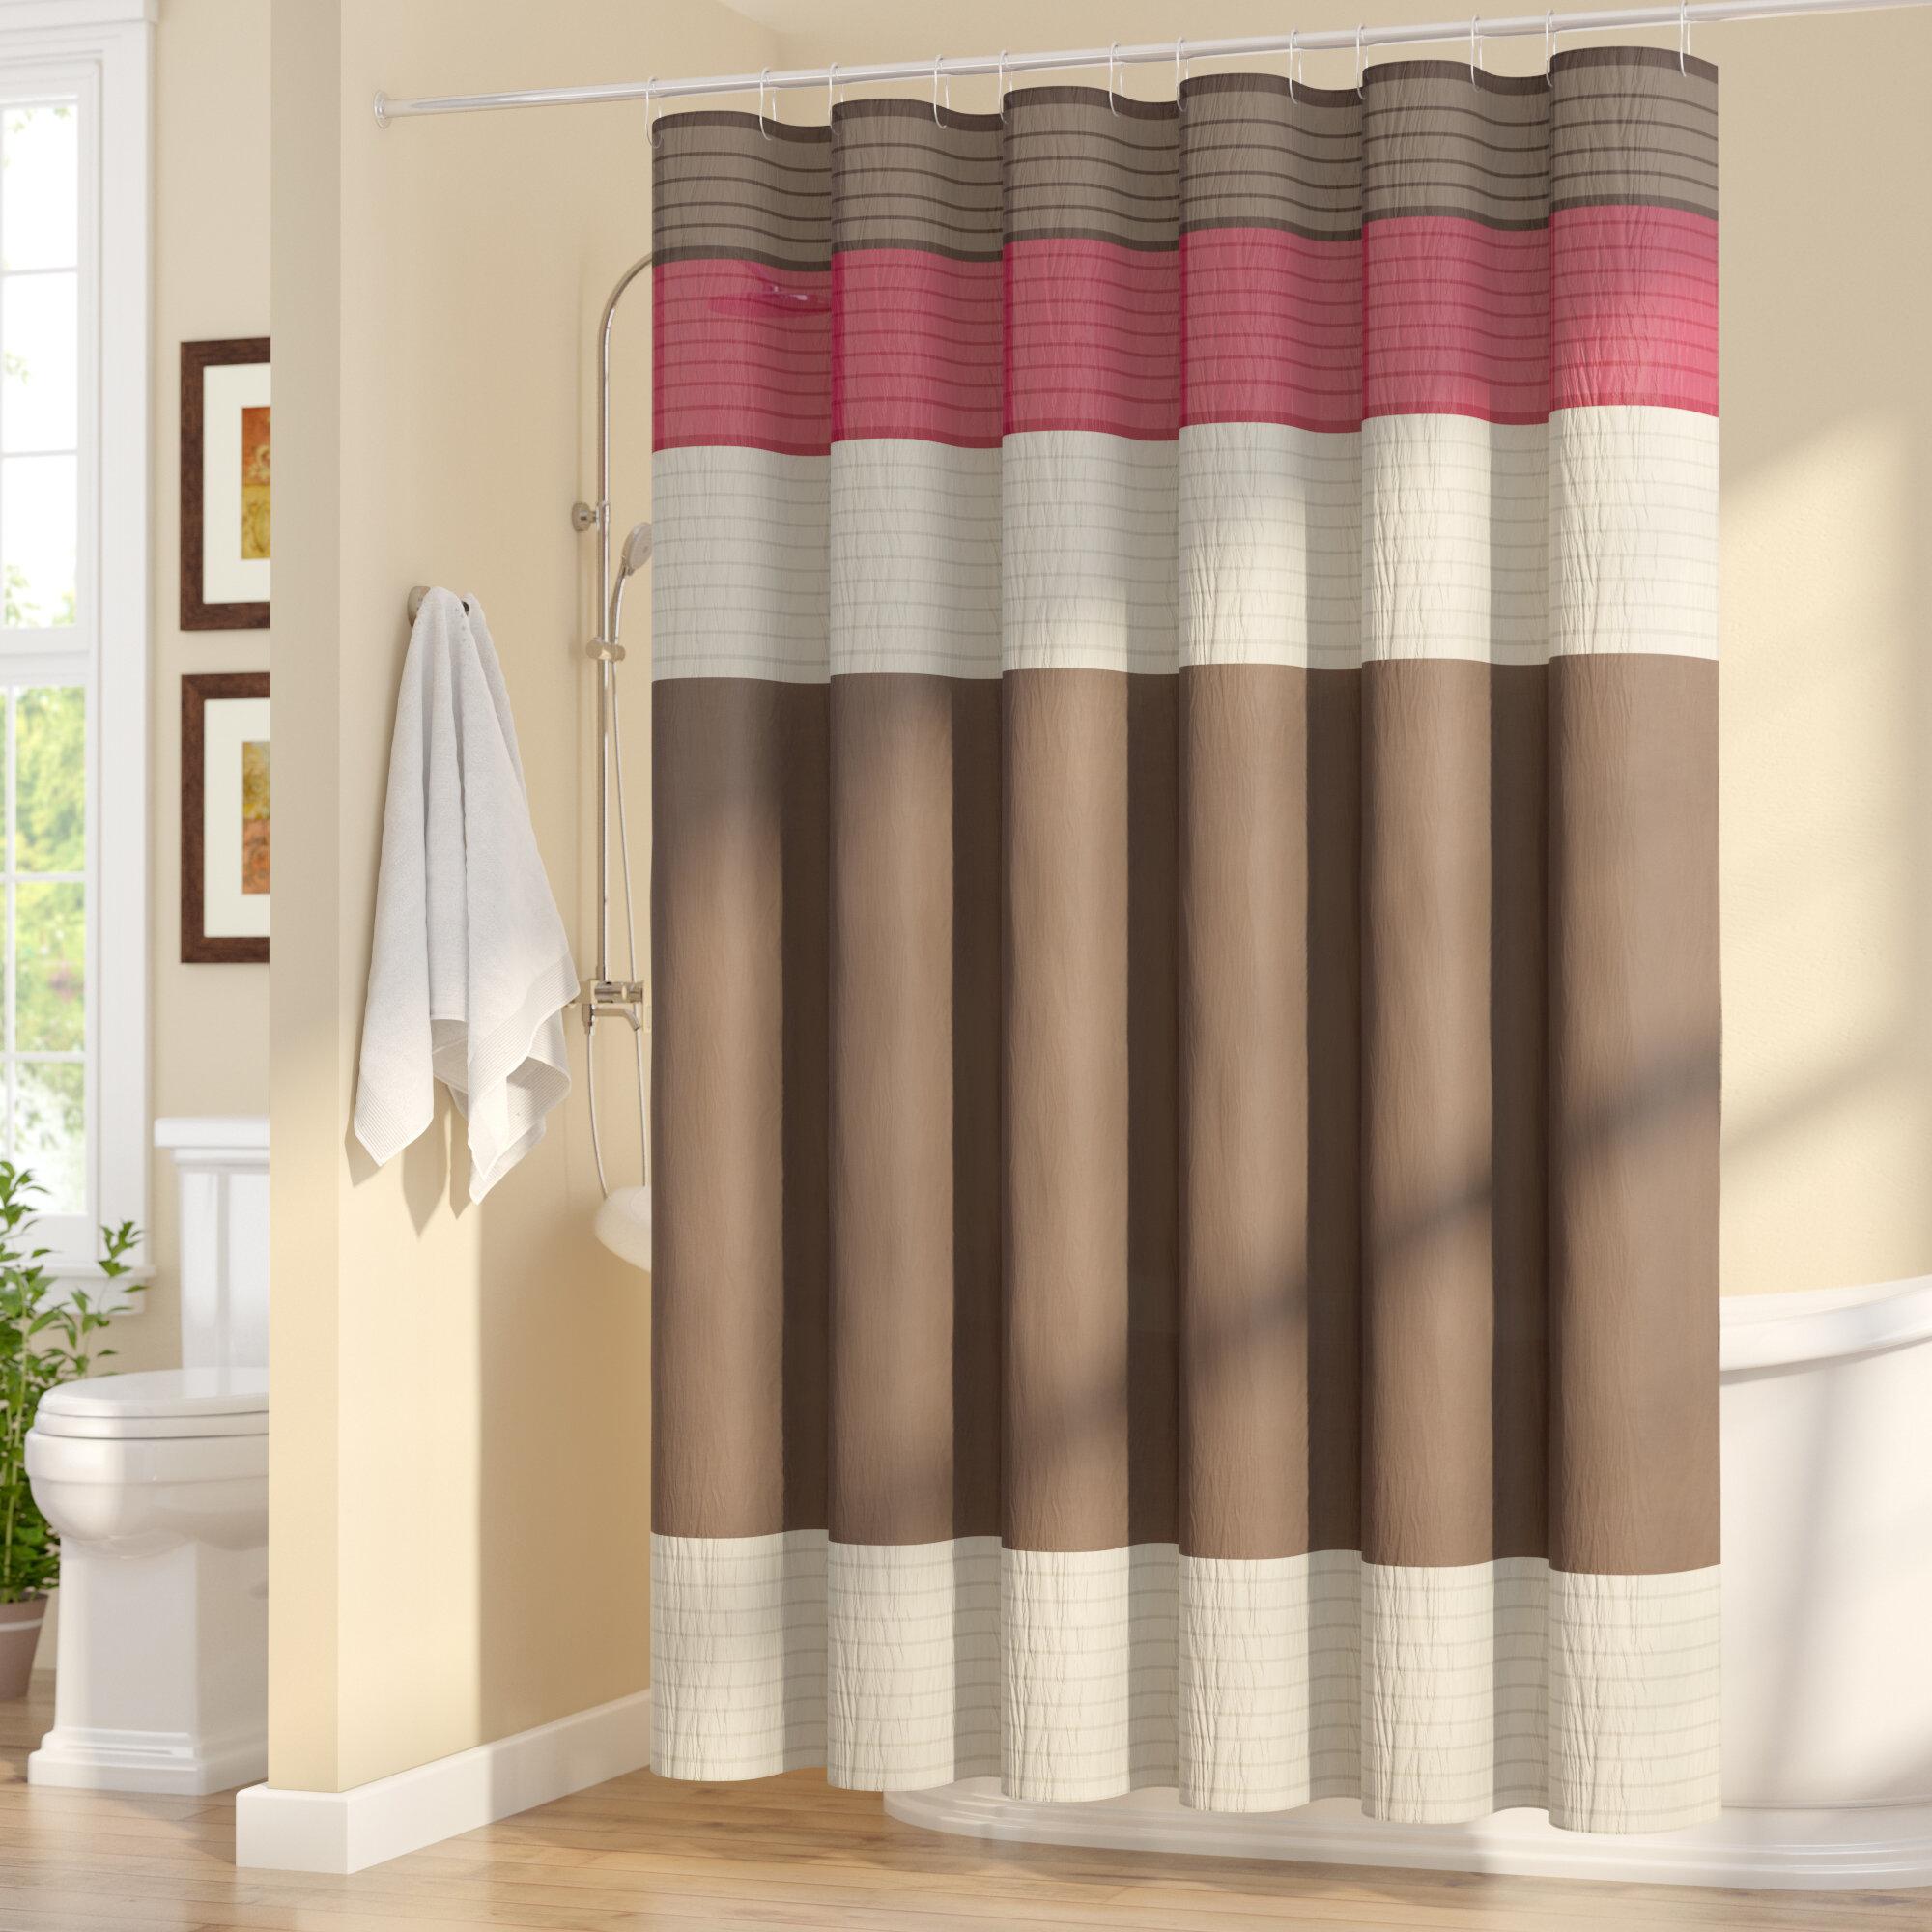 Three Posts Berardi Shower Curtain & Reviews | Wayfair